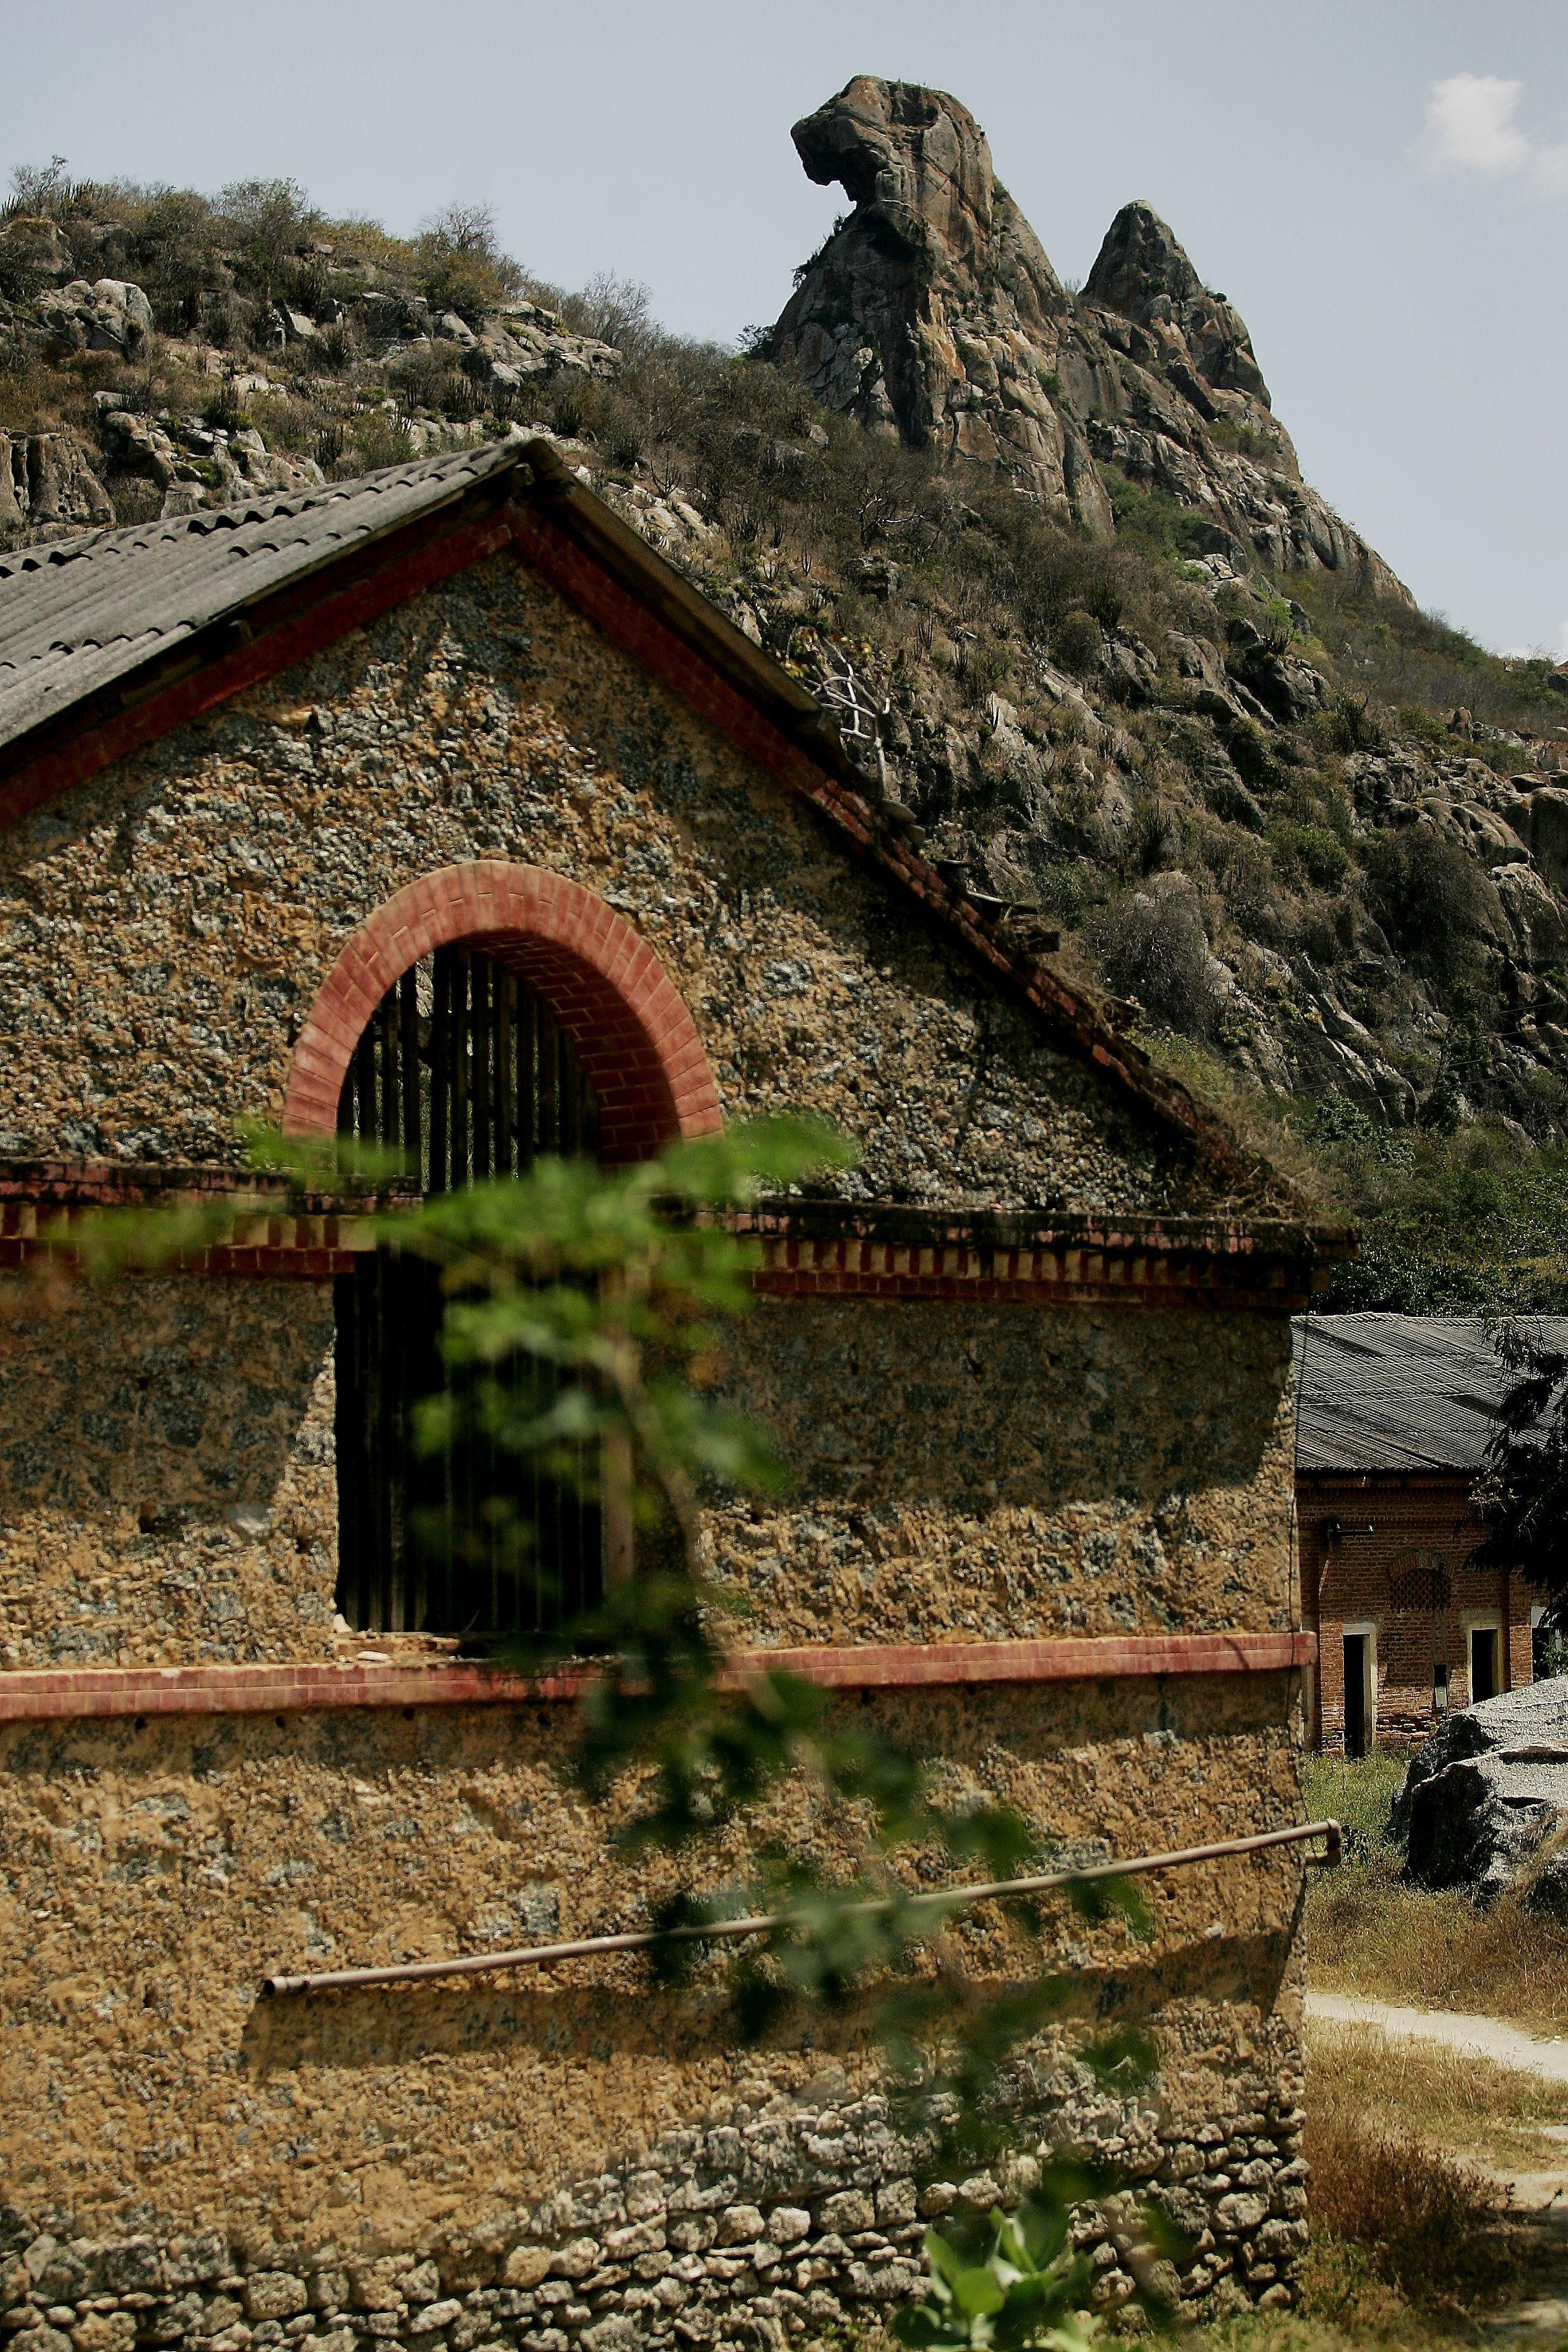 Pedra Da Galinha Choca Rock Of The Brooding Hen Quixada Ceara